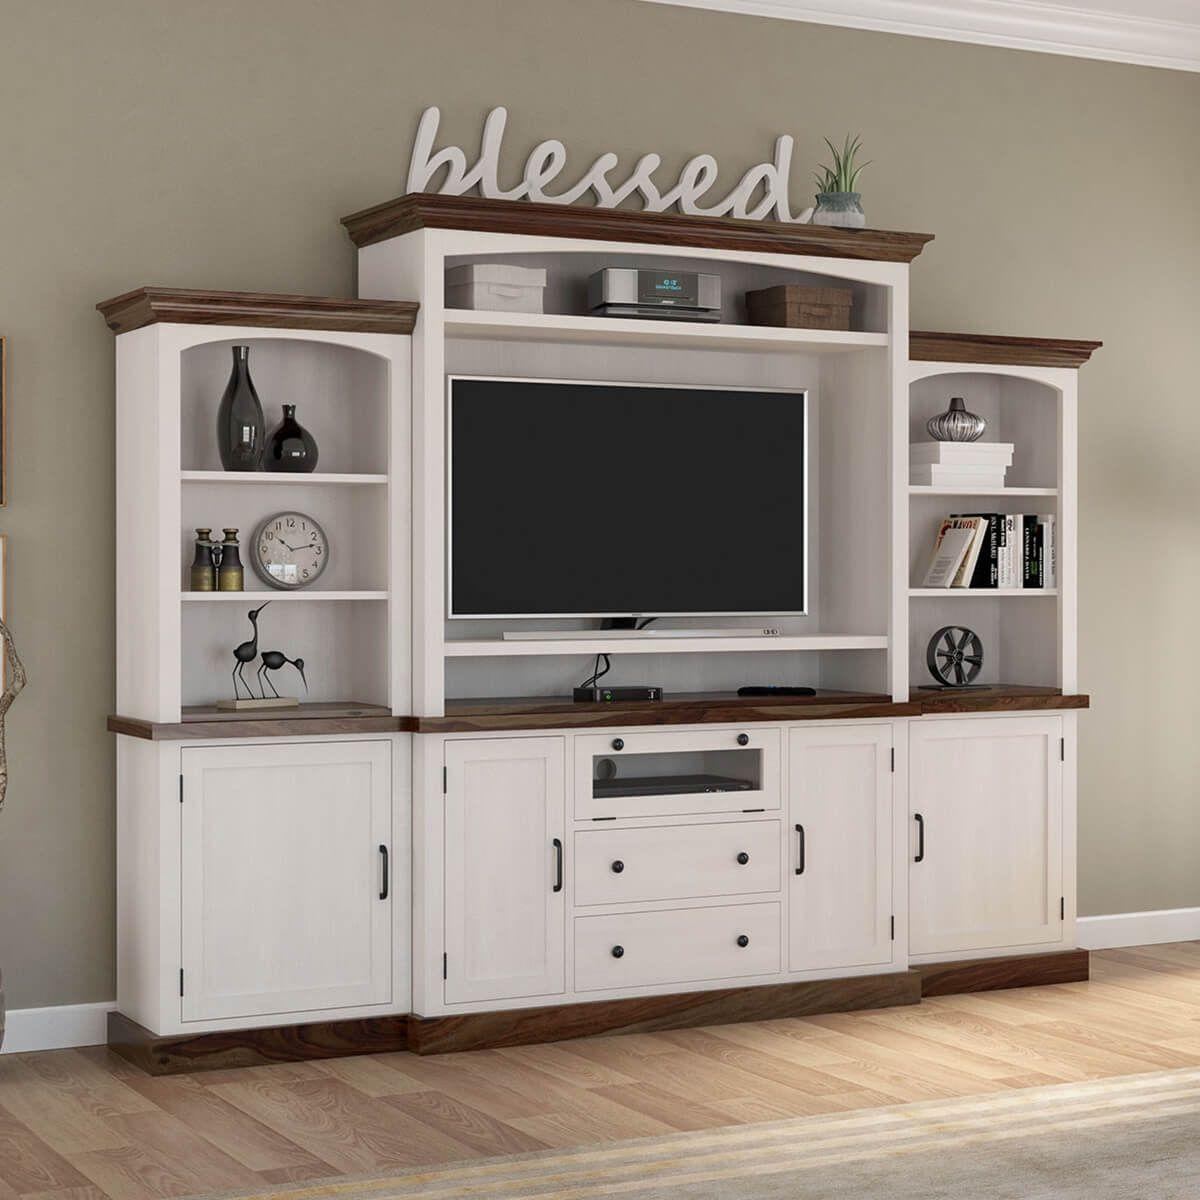 Morven Two Tone Solid Wood Entertainment Center With Bookshelves In 2020 Wood Entertainment Center Living Room Entertainment Center